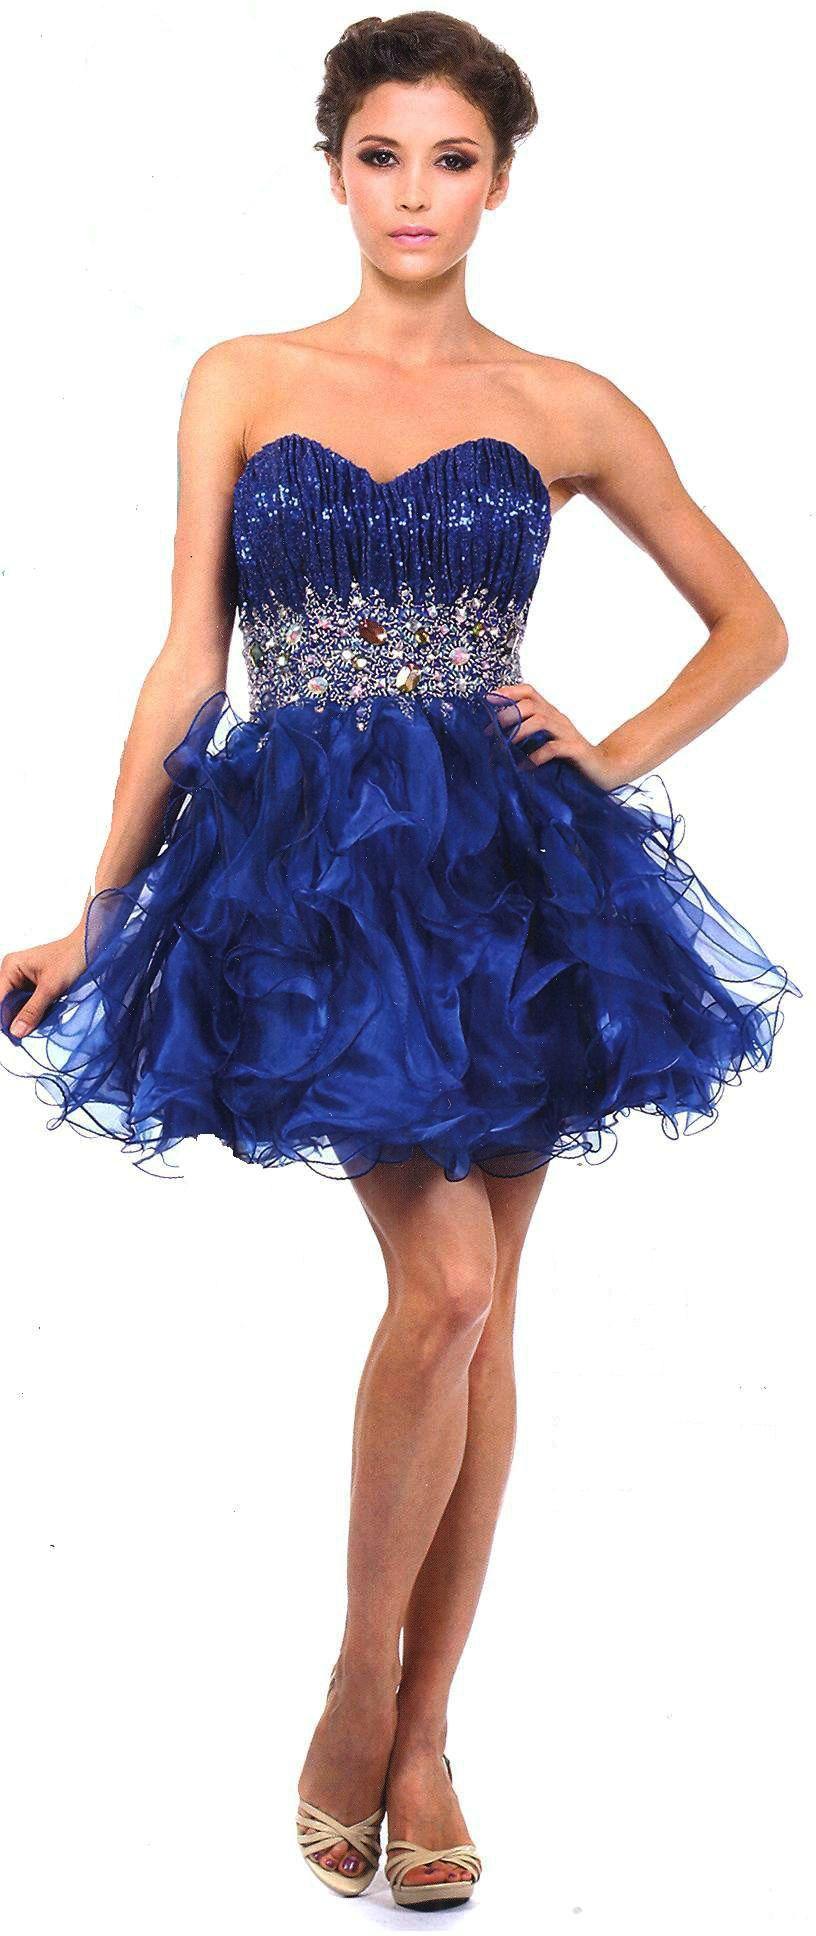 Sweet dresshomecoming dress under binspiration sparkles